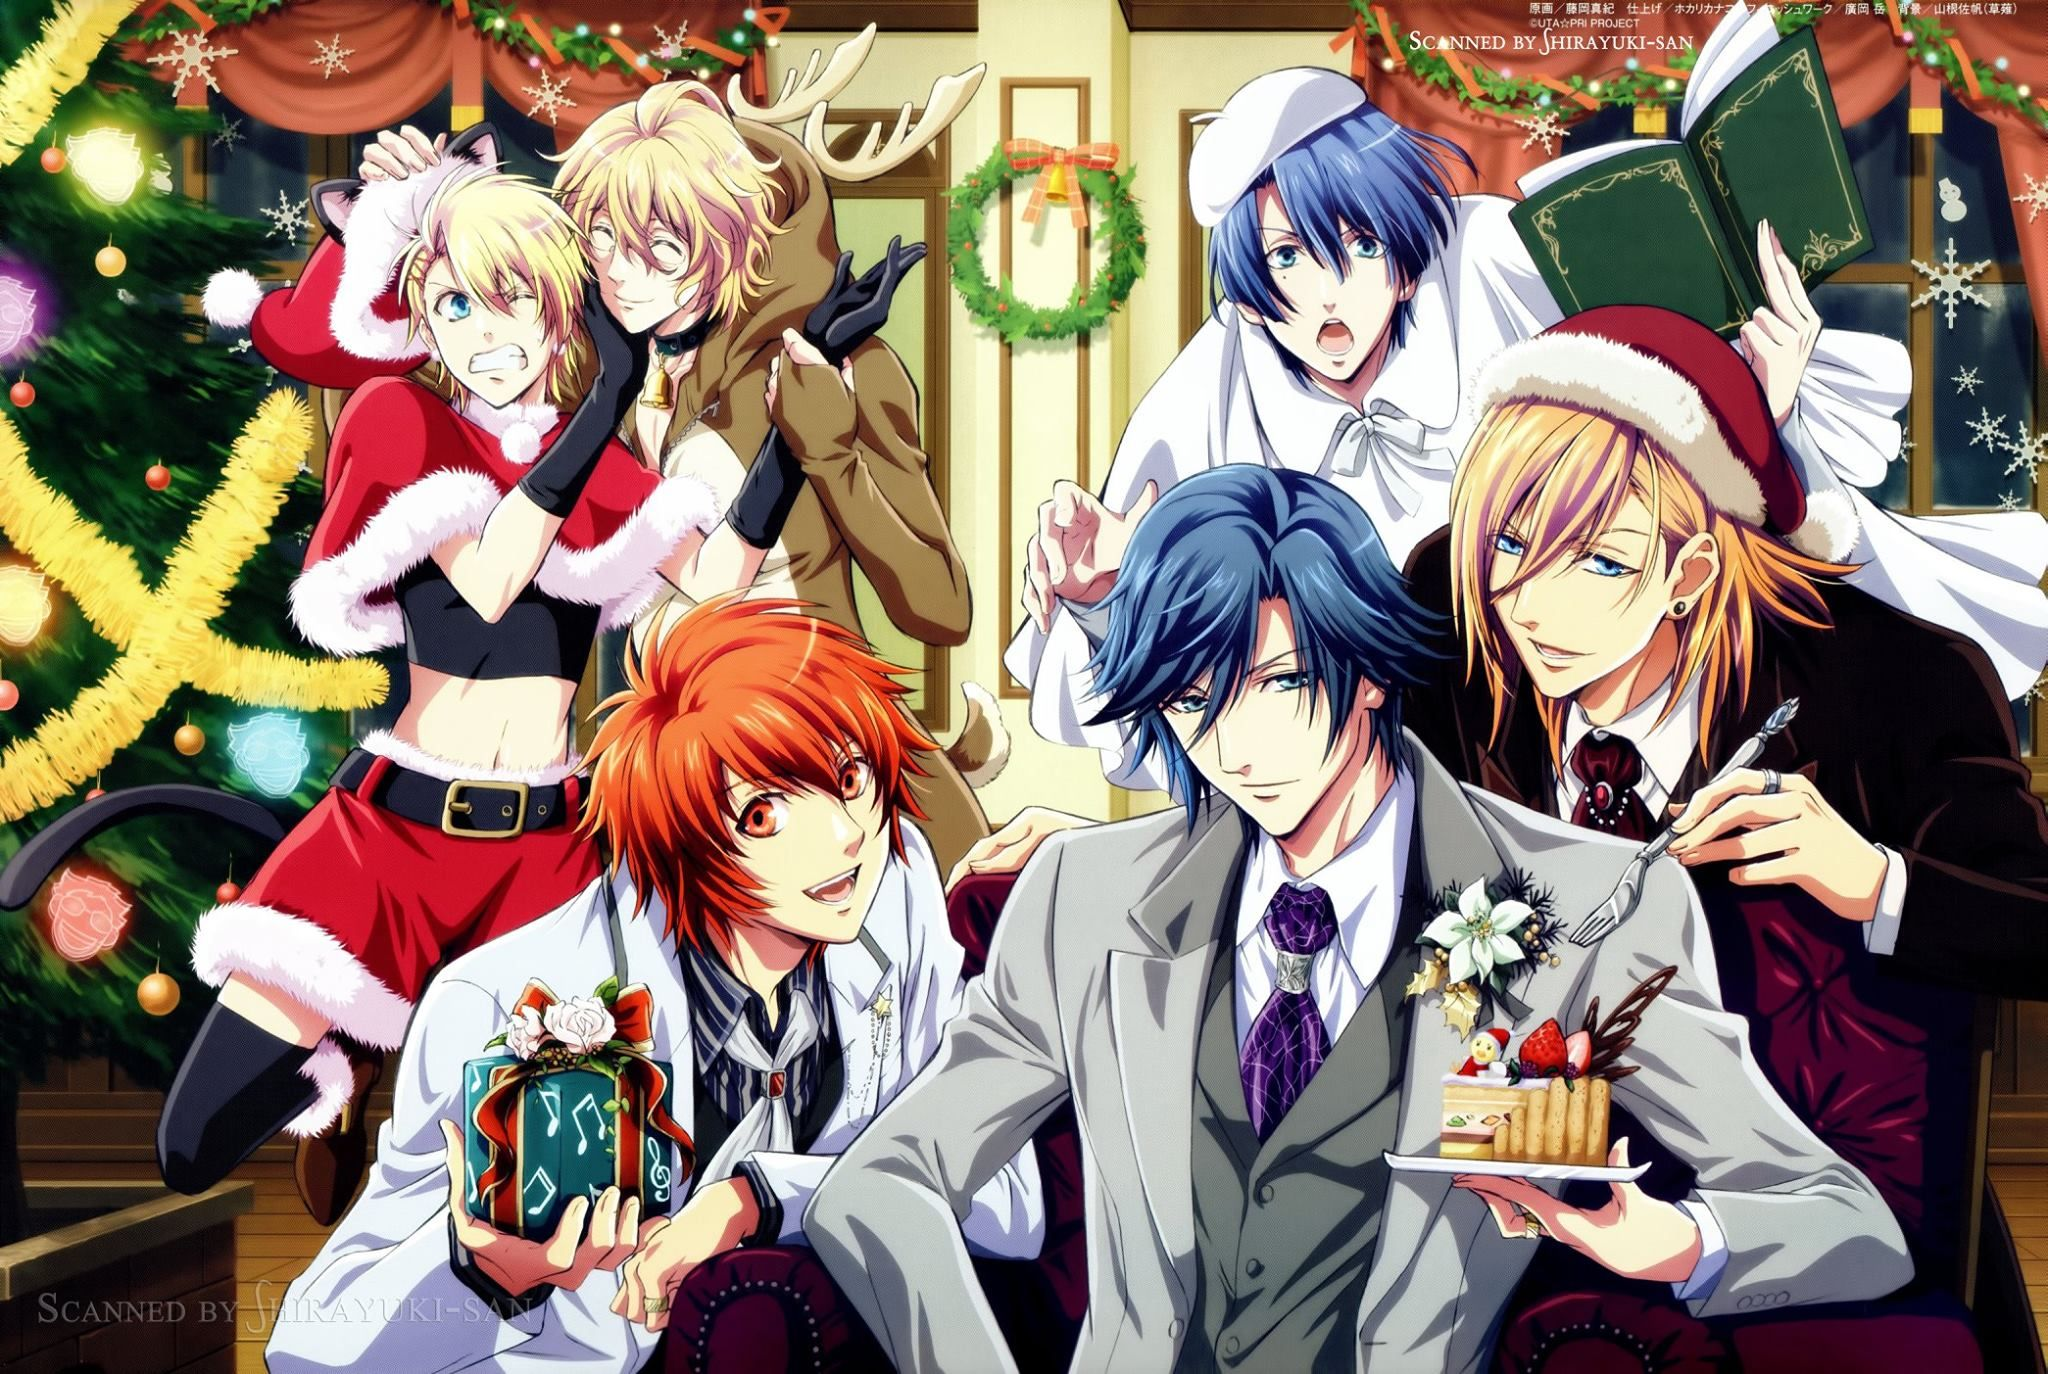 Pin von momo ☆ auf Uta no prince sama Anime, Ische